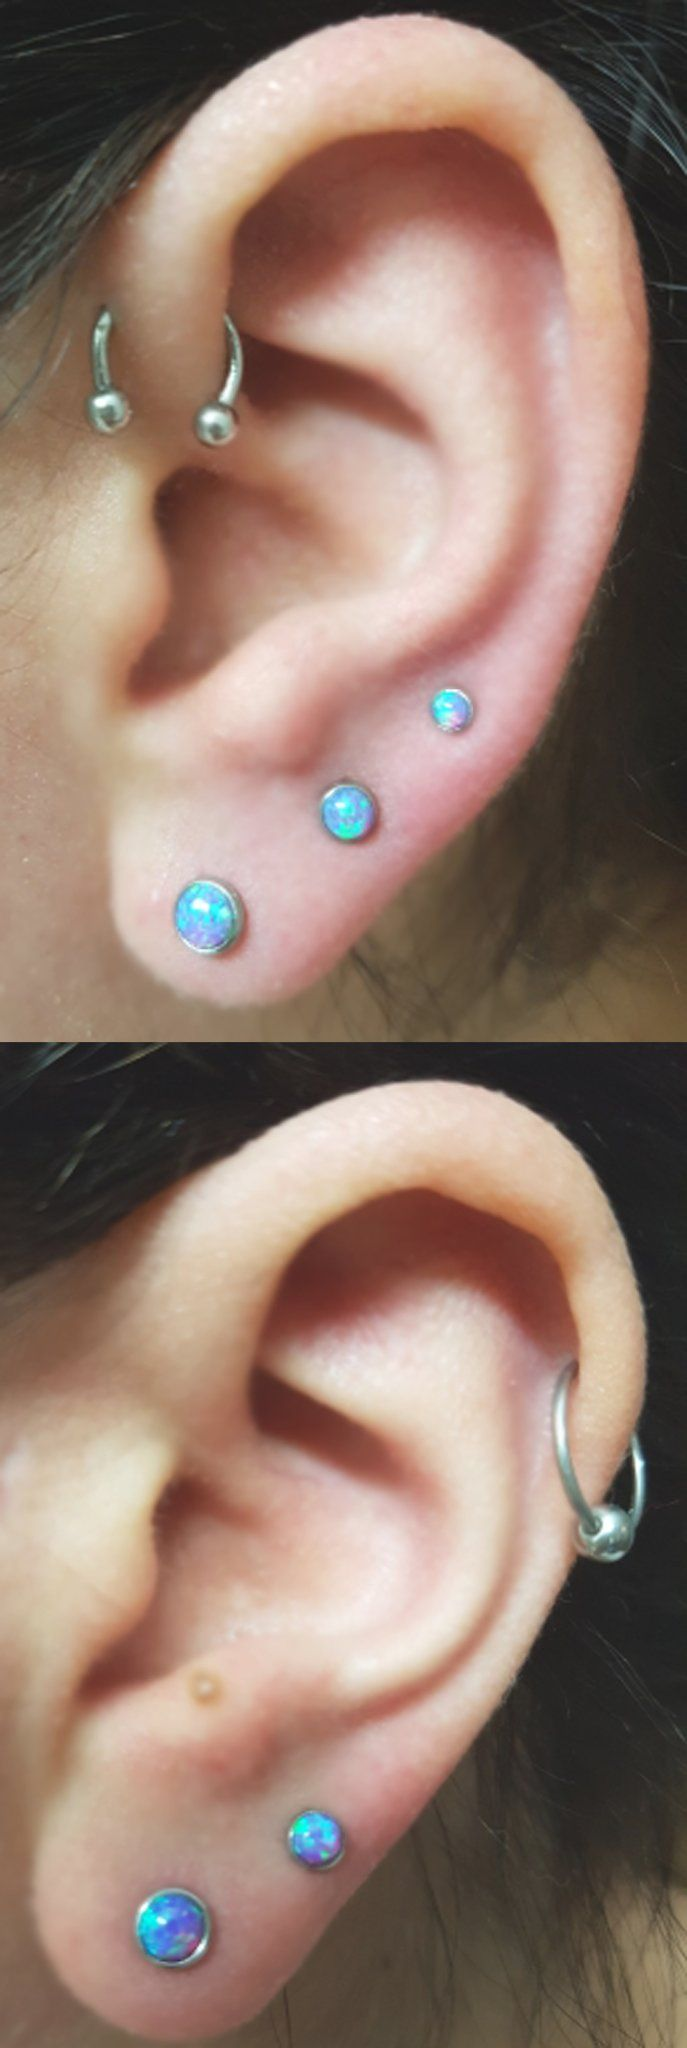 Nose piercing day 3   best Piercings images on Pinterest  Piercings Piercing ideas